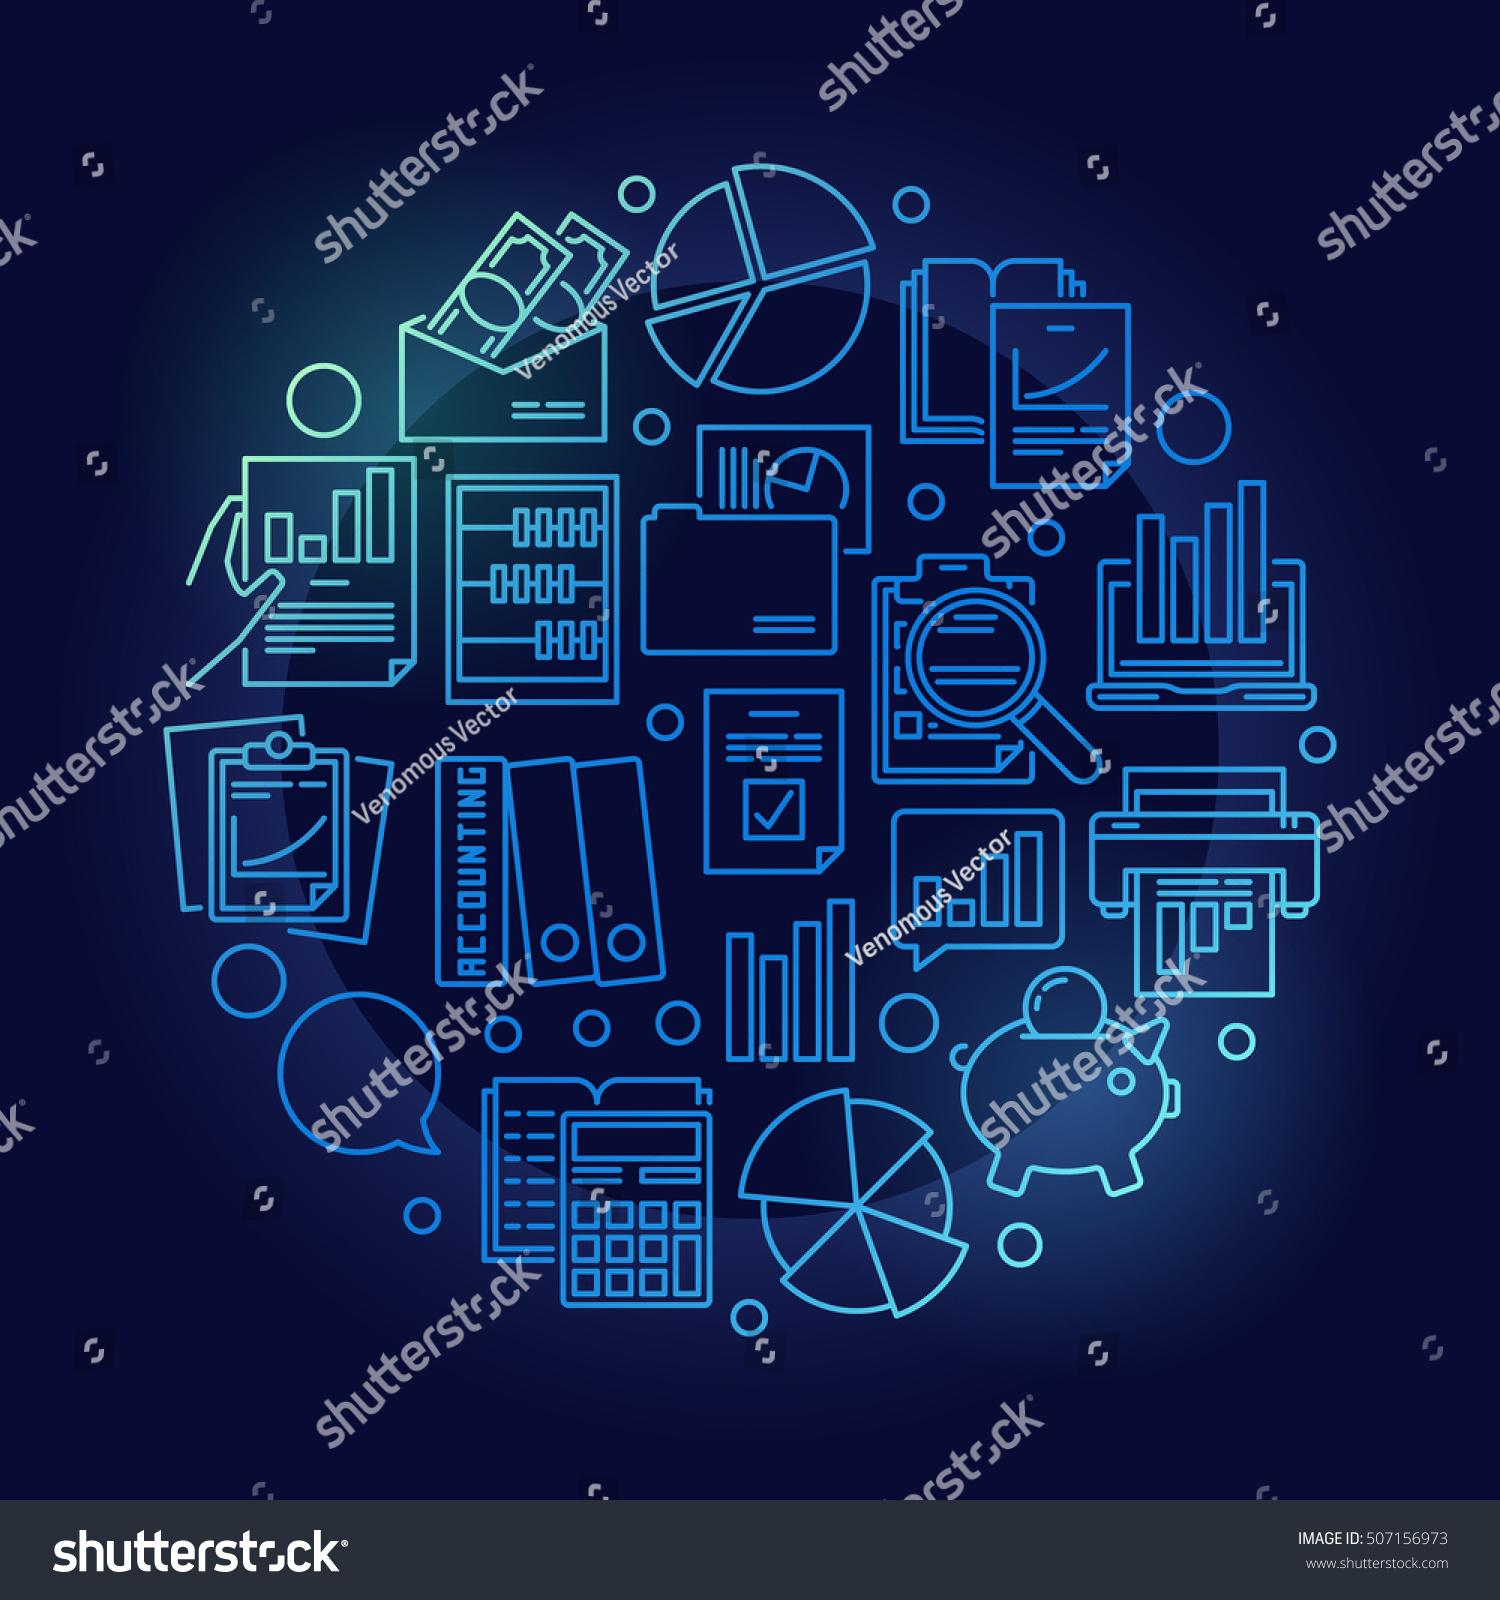 Accounting: Blue Accounting Research Illustration Vector Circular